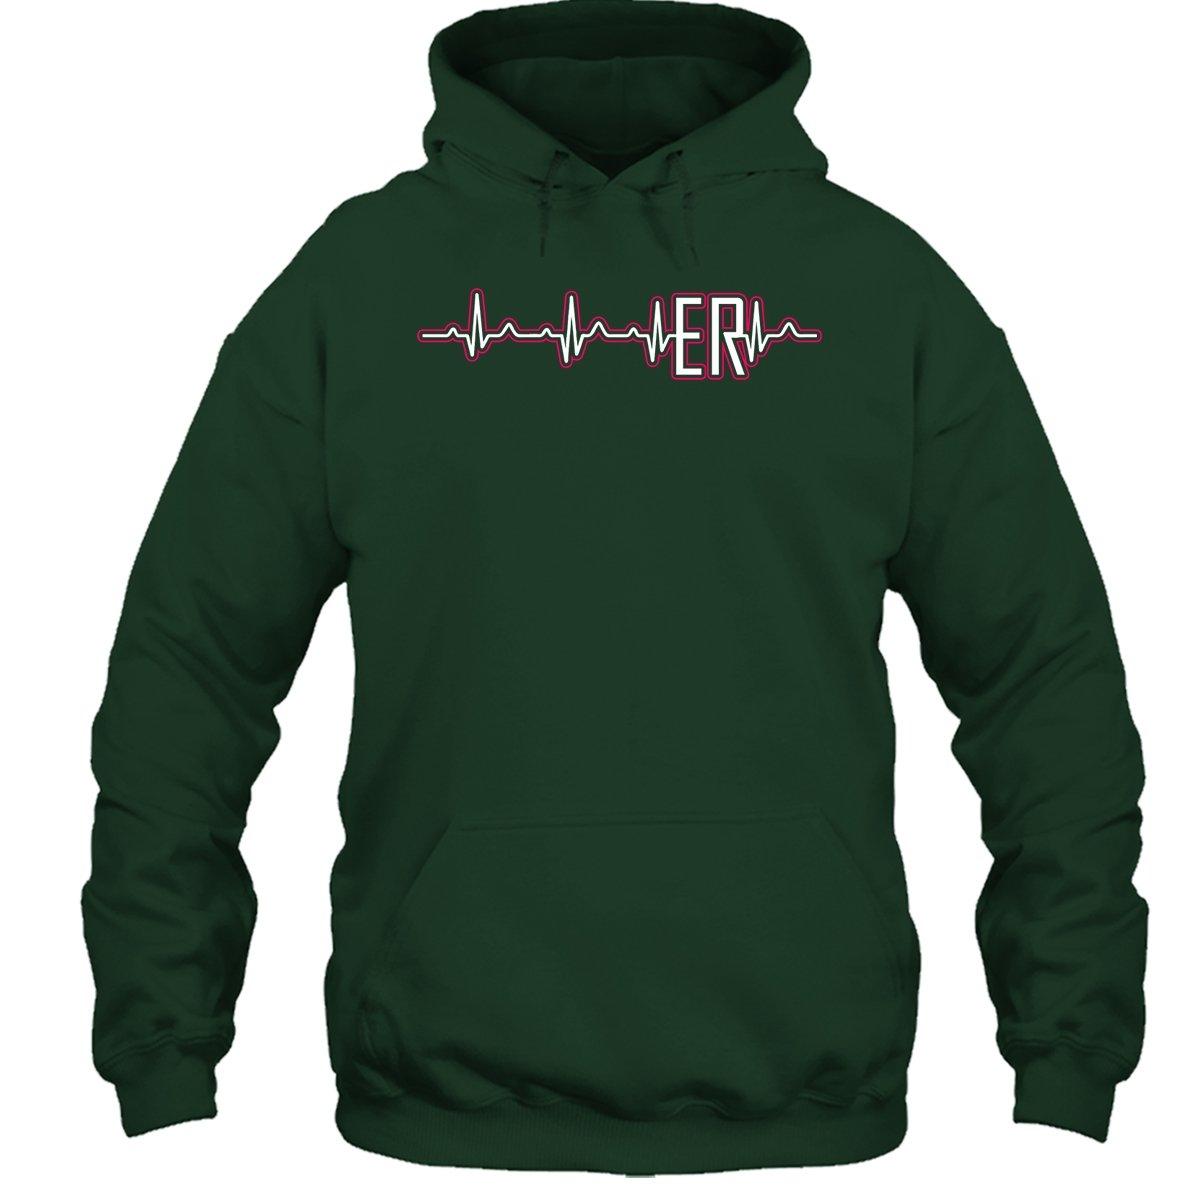 ER Nurse T-Shirt ER Nurse Heartbeat Tee Shirts for Someone Special